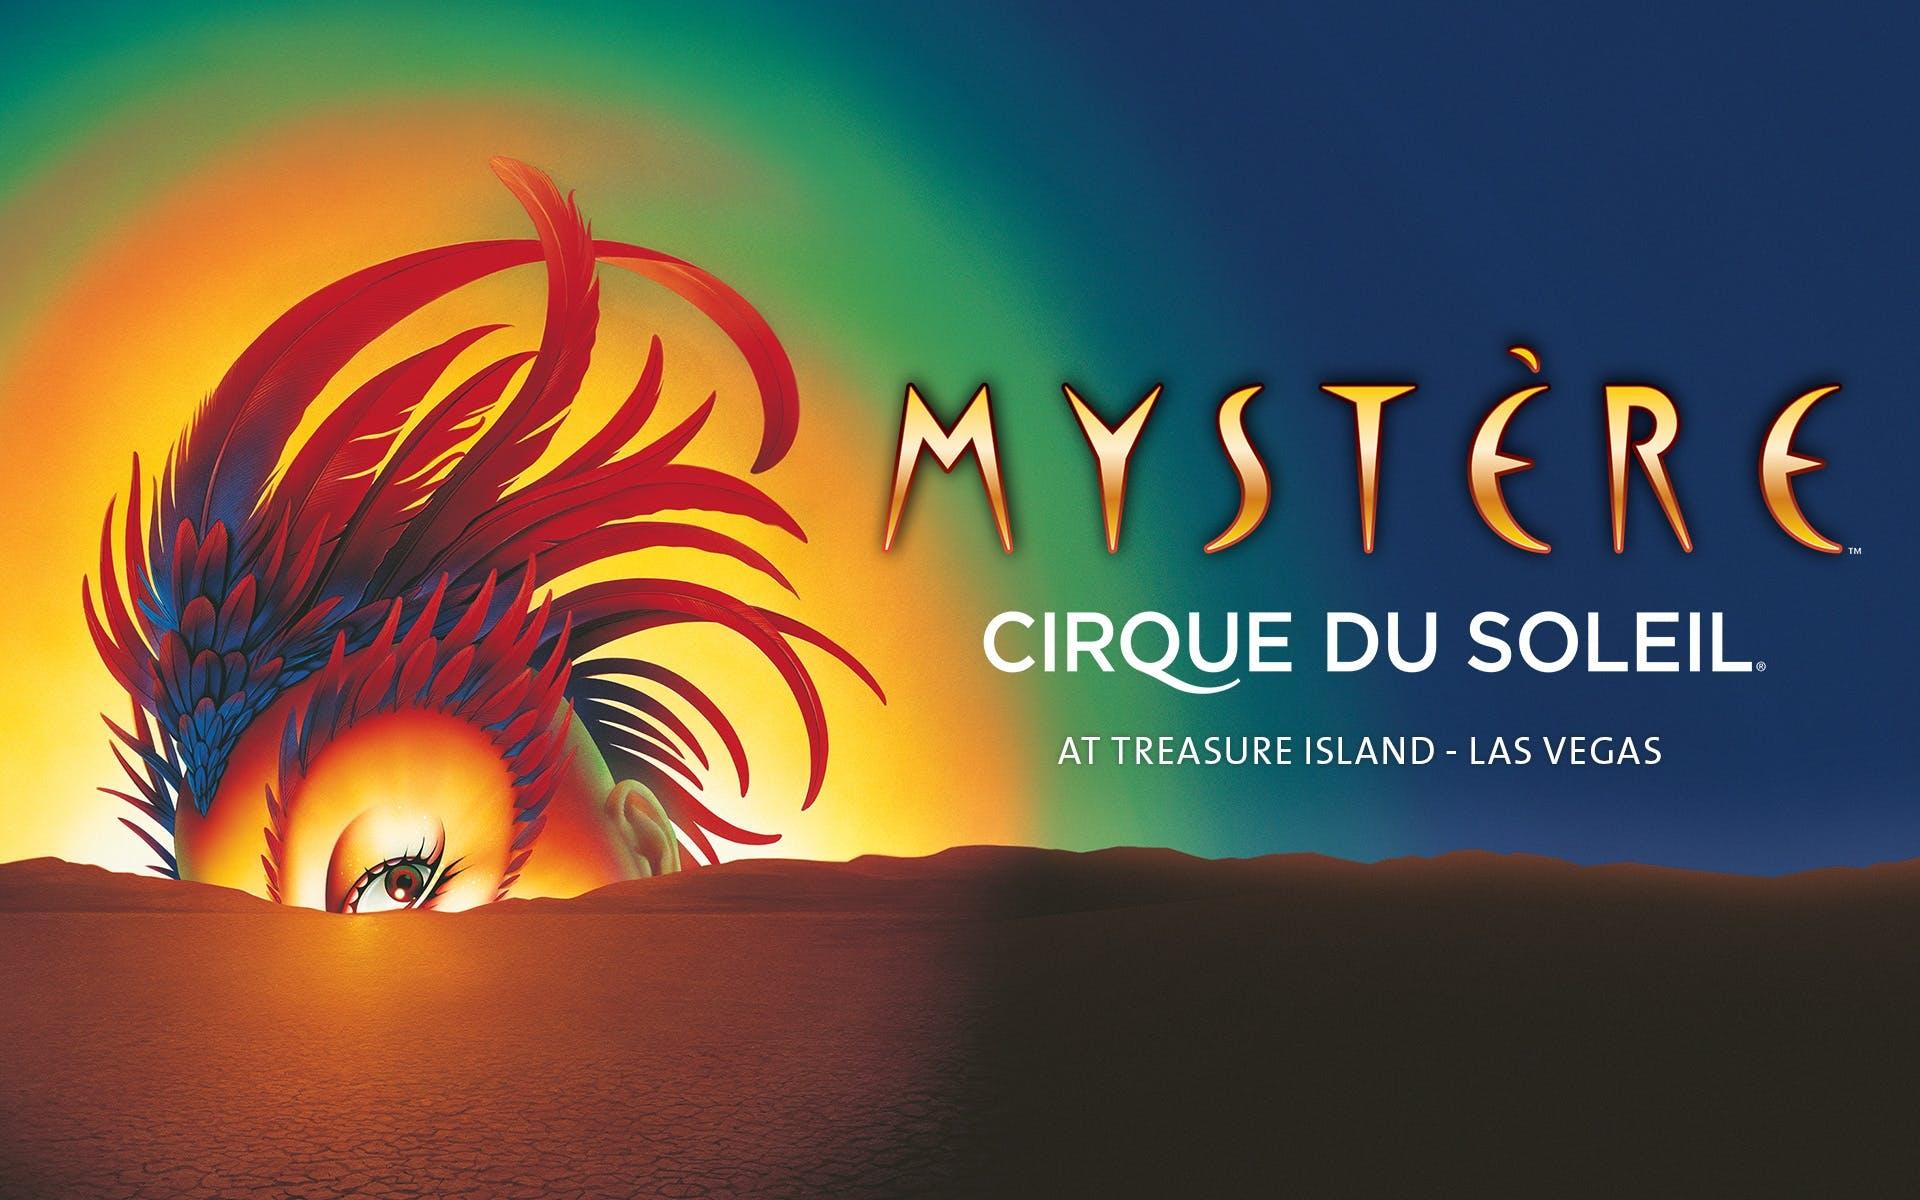 Cirque du Soleil Mystère at Treasure Island in Las Vegas - Tickets